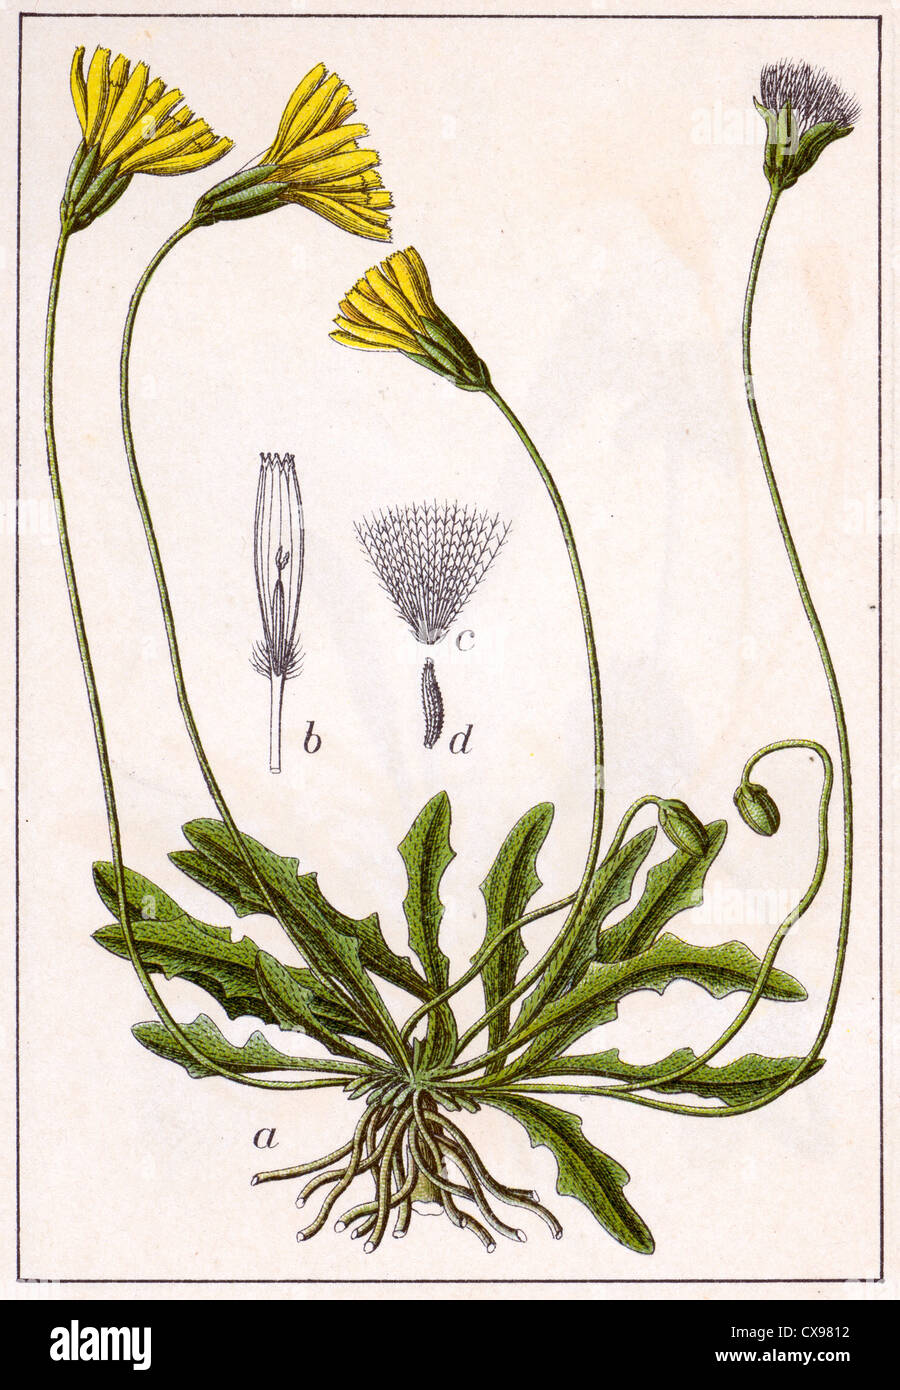 Thrincia hirta - Stock Image